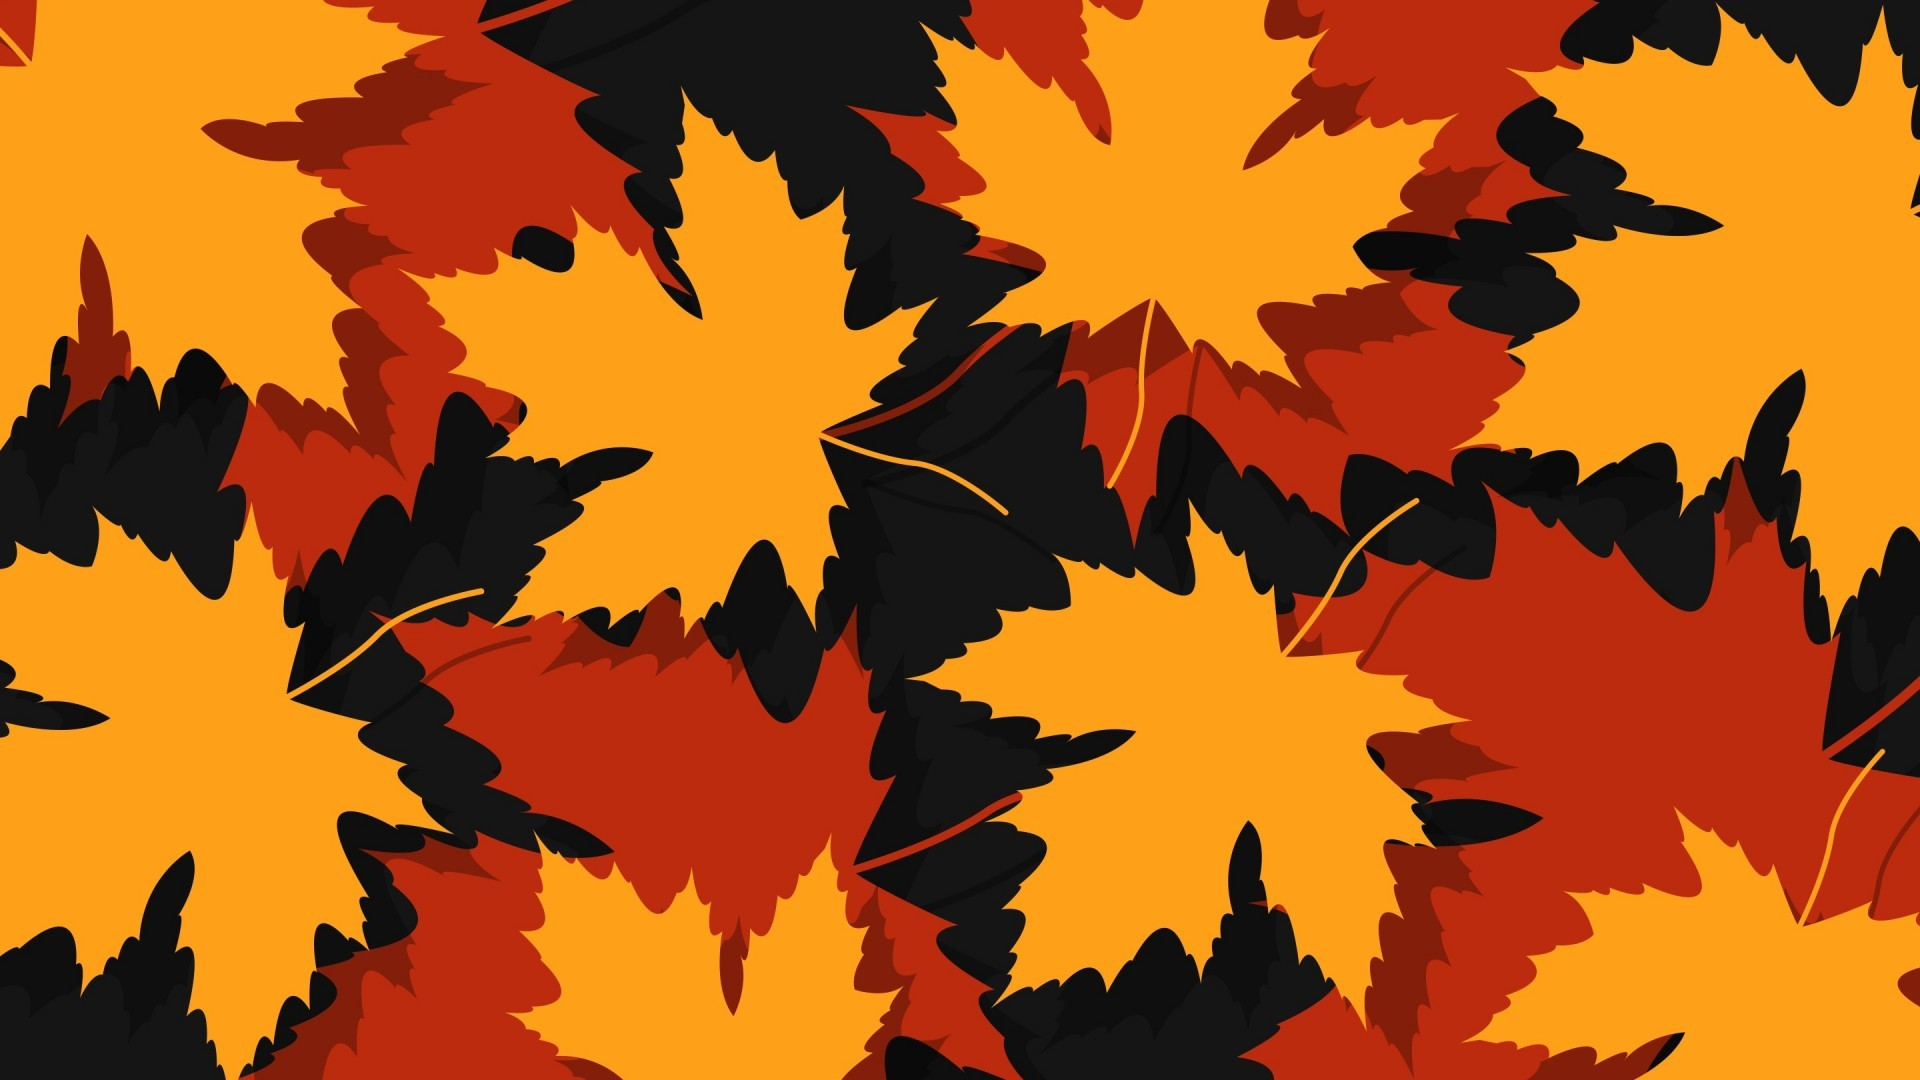 General 1920x1080 leaves maple leaves vector plants artwork